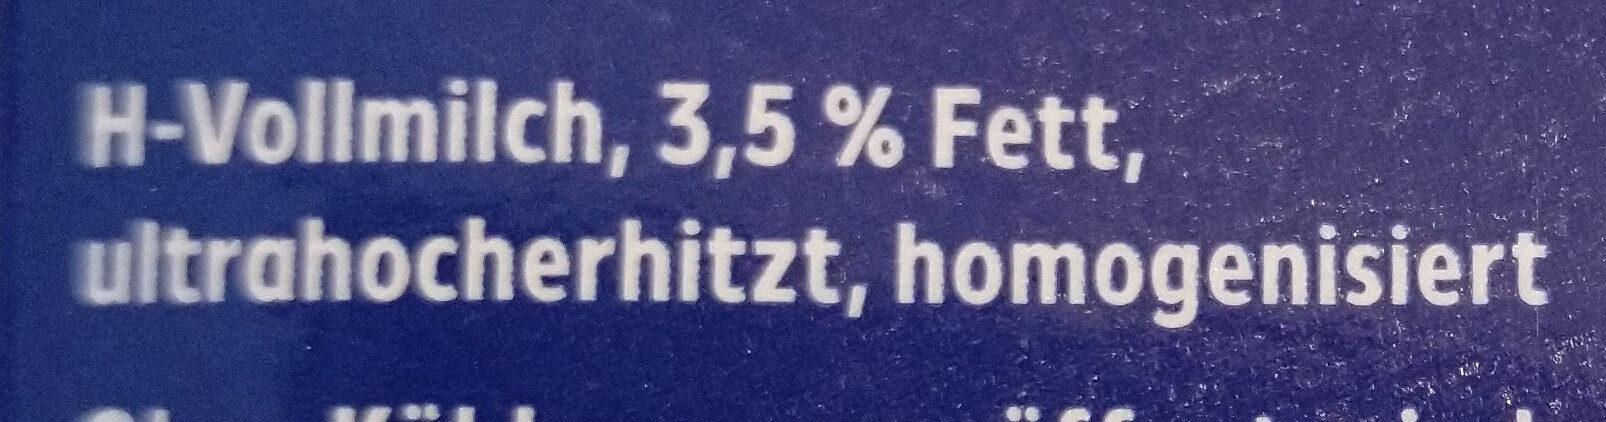 Haltbare Vollmilch - Ingrédients - de